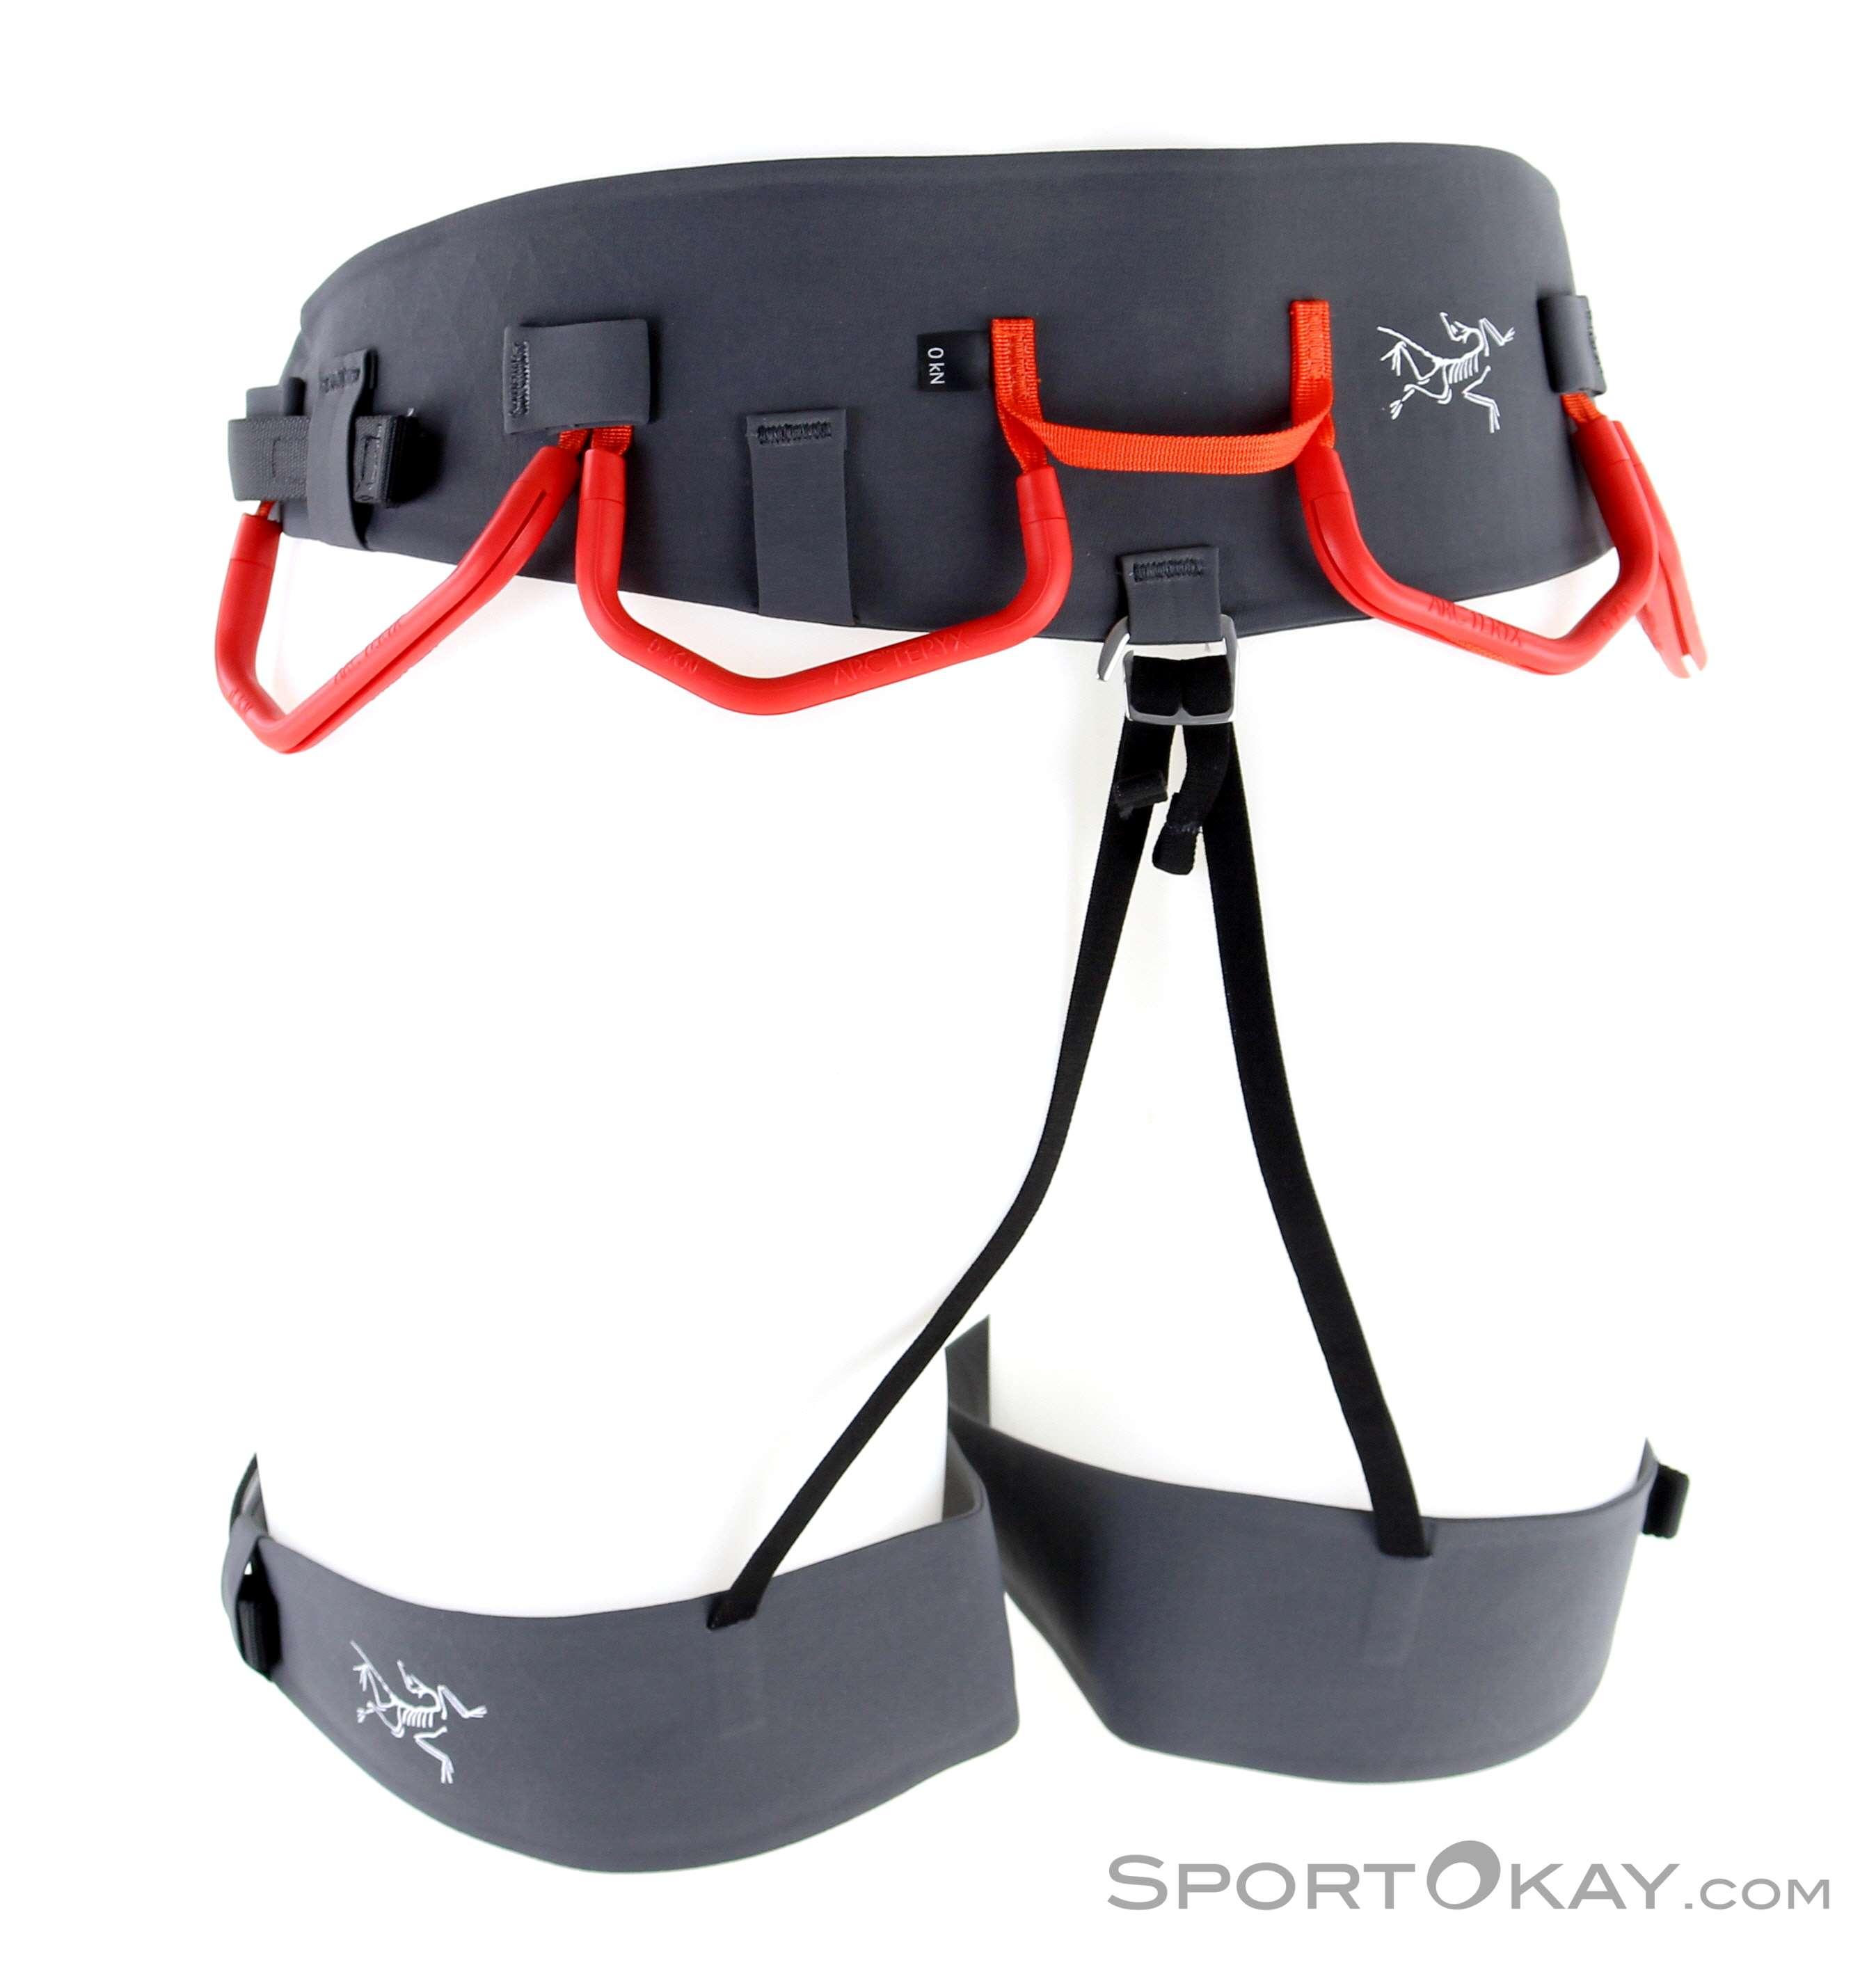 6a0ac45a9ea Arcteryx AR-395 A Harness Mens Climbing Harness , Arcteryx, Black, , ,